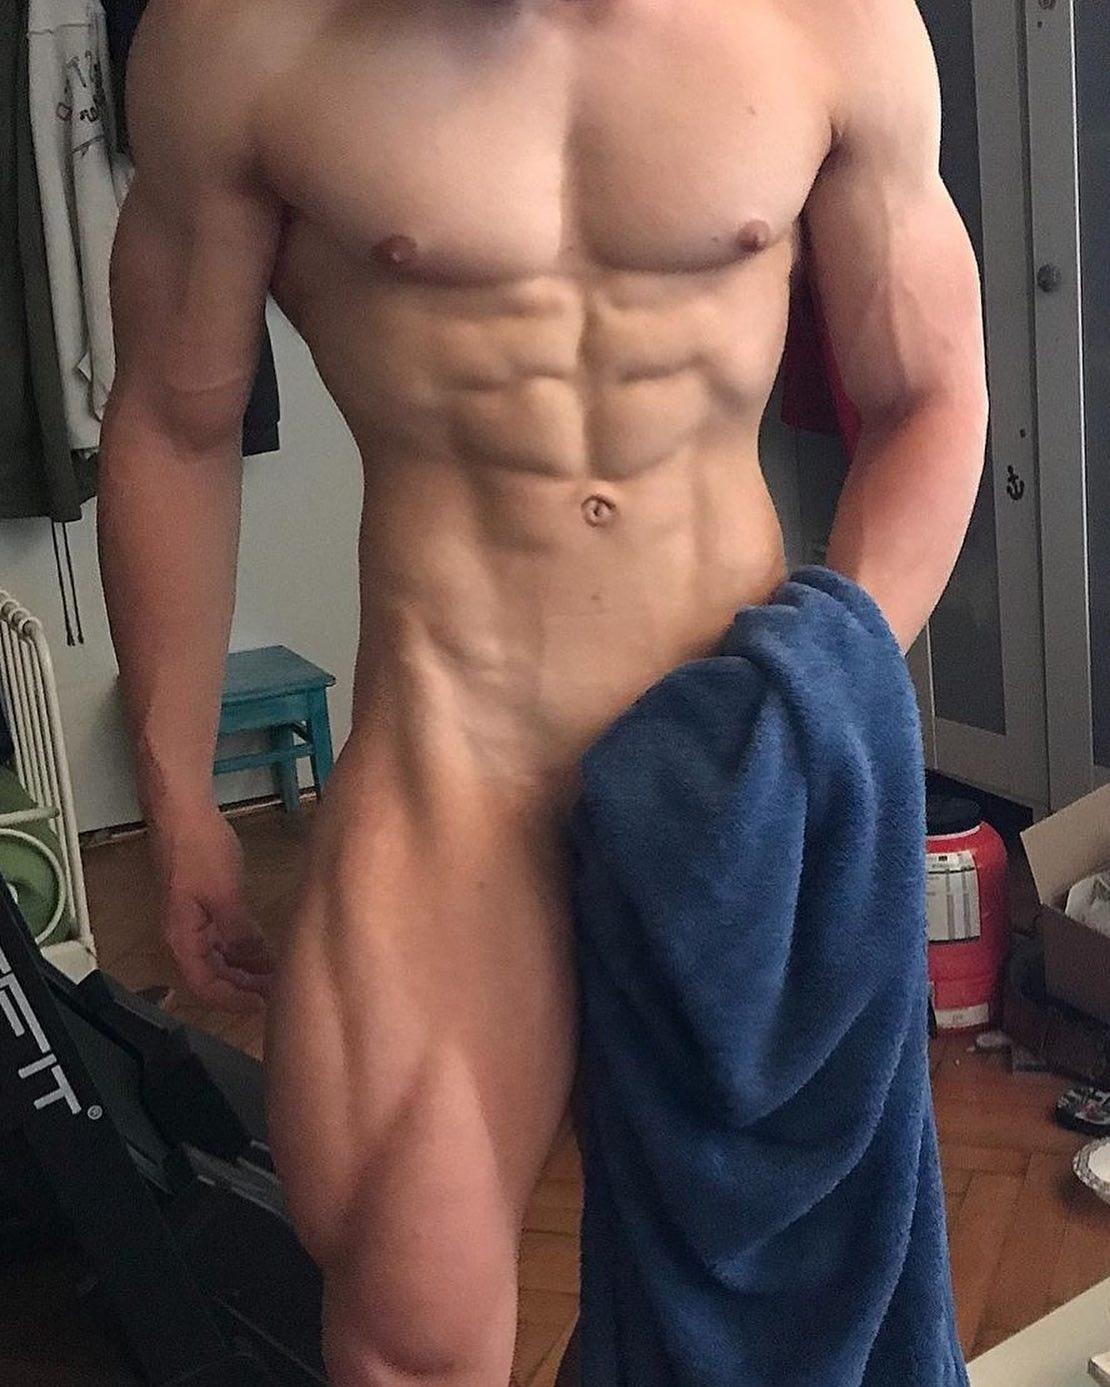 #men #muscle #hotmen #abs #hunks